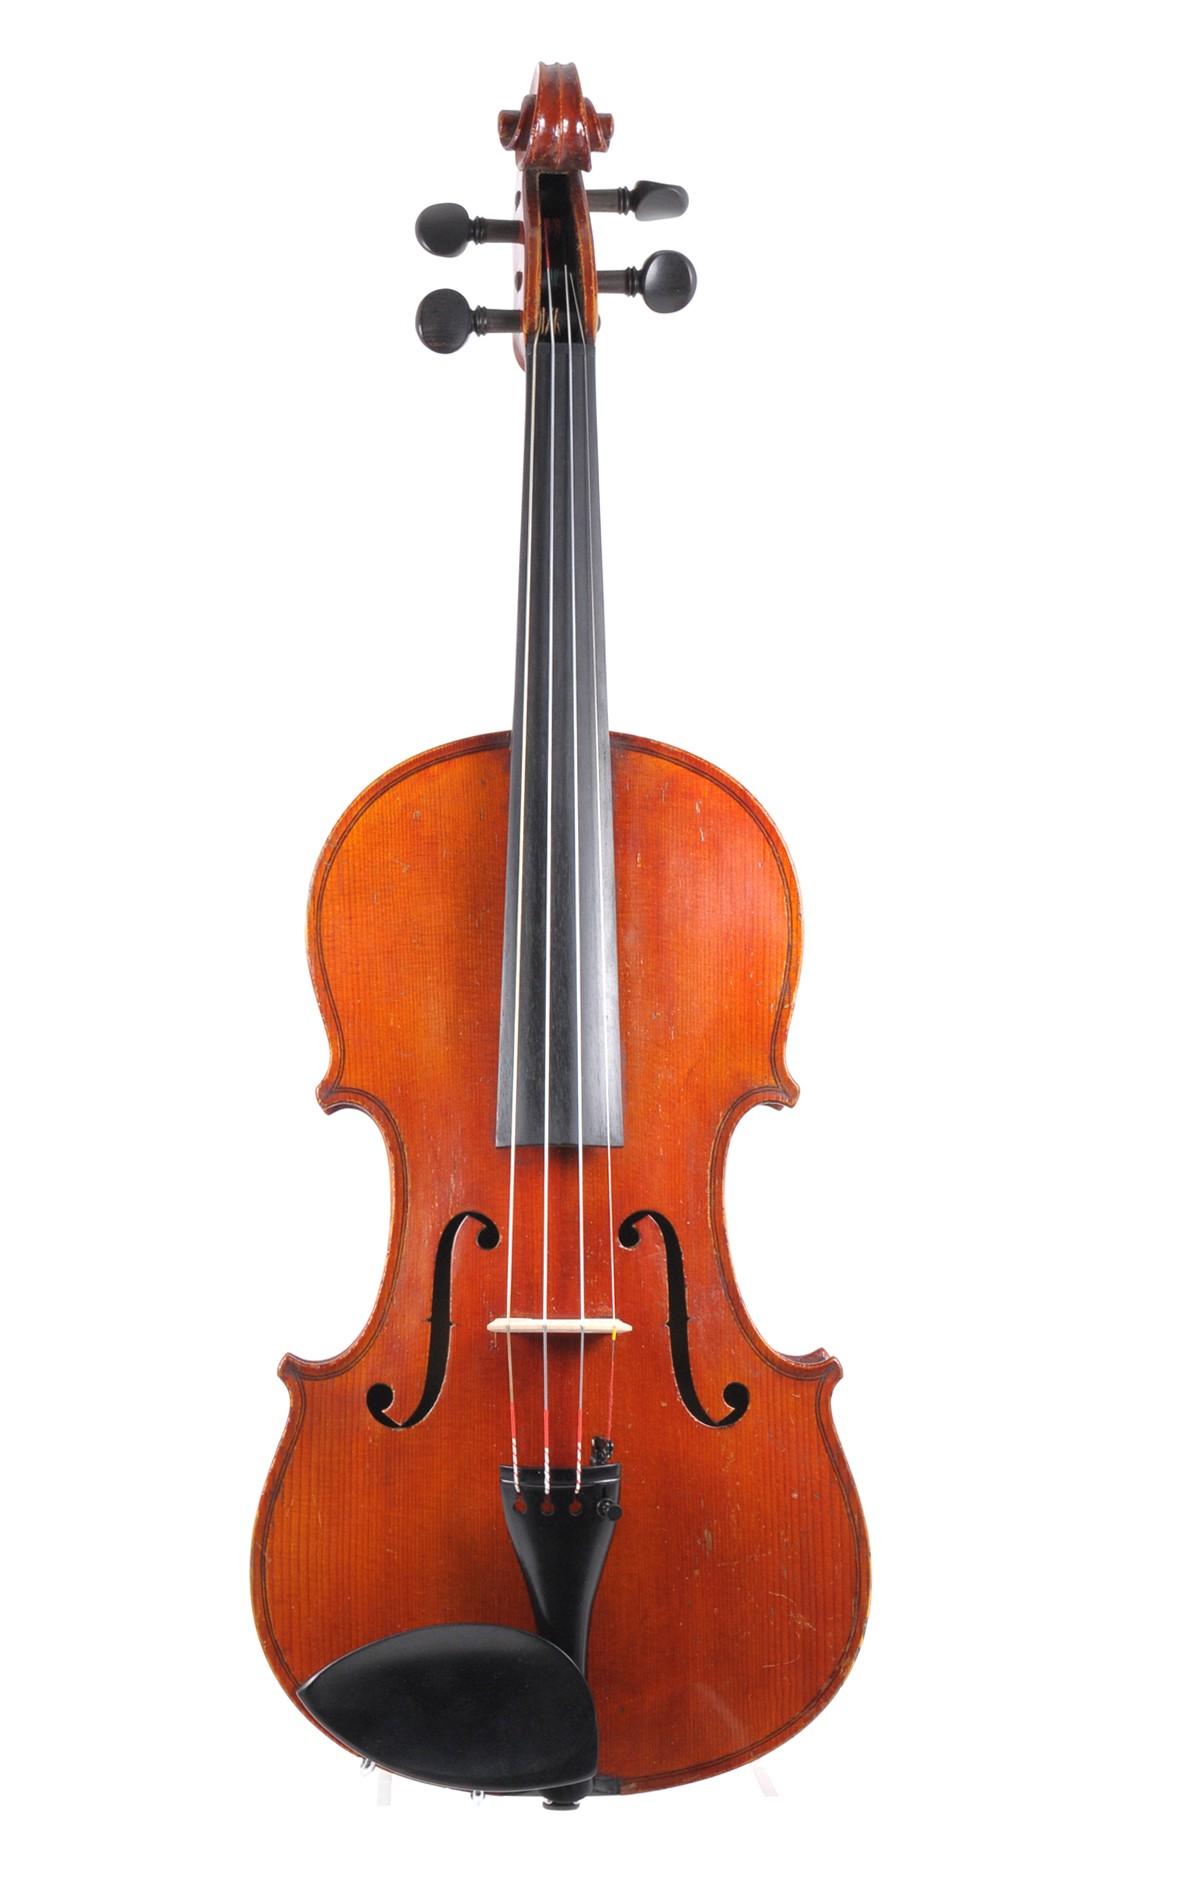 Antique violin of Klingenthal, resonant sound